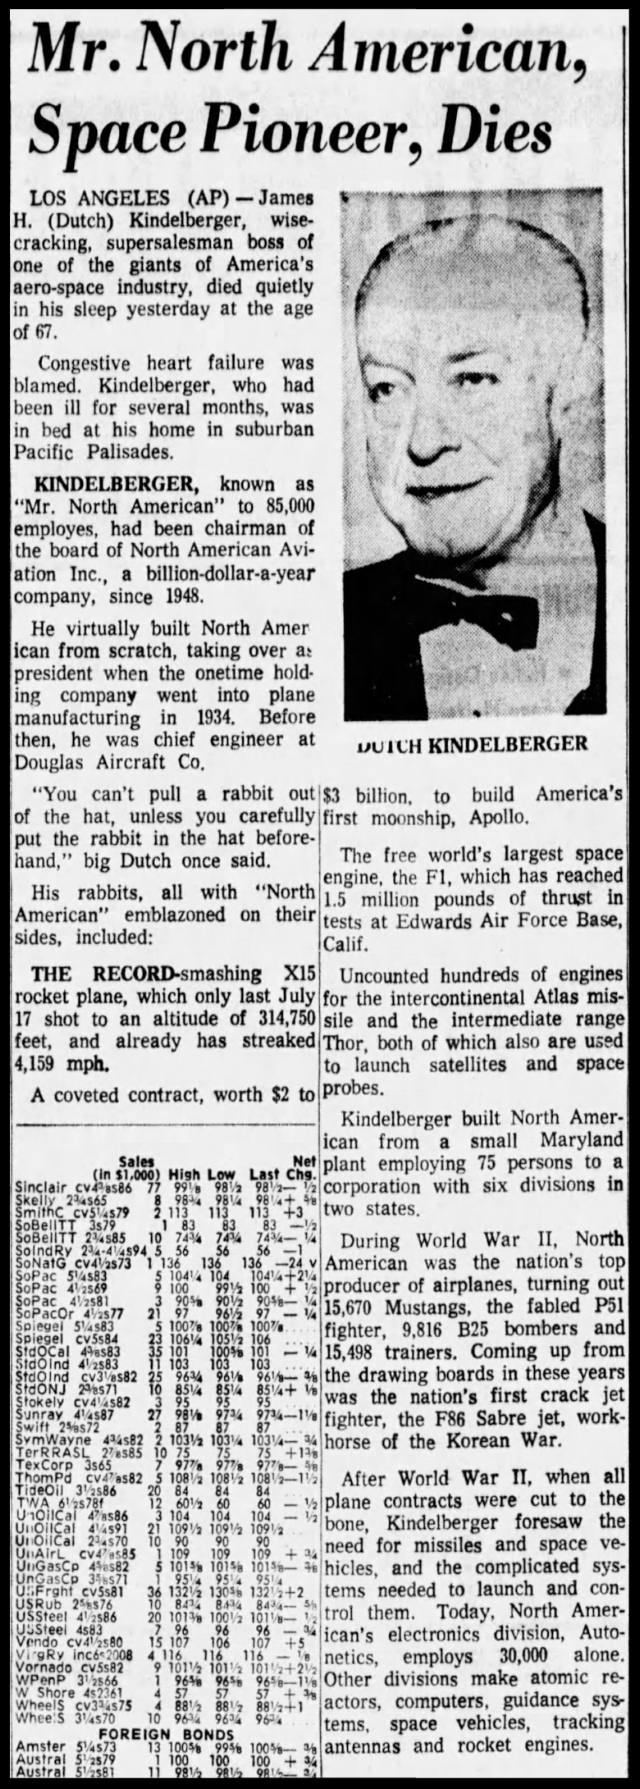 """ Mr. North American Dies."" Arizona Republic, Sat., July 28, 1962."